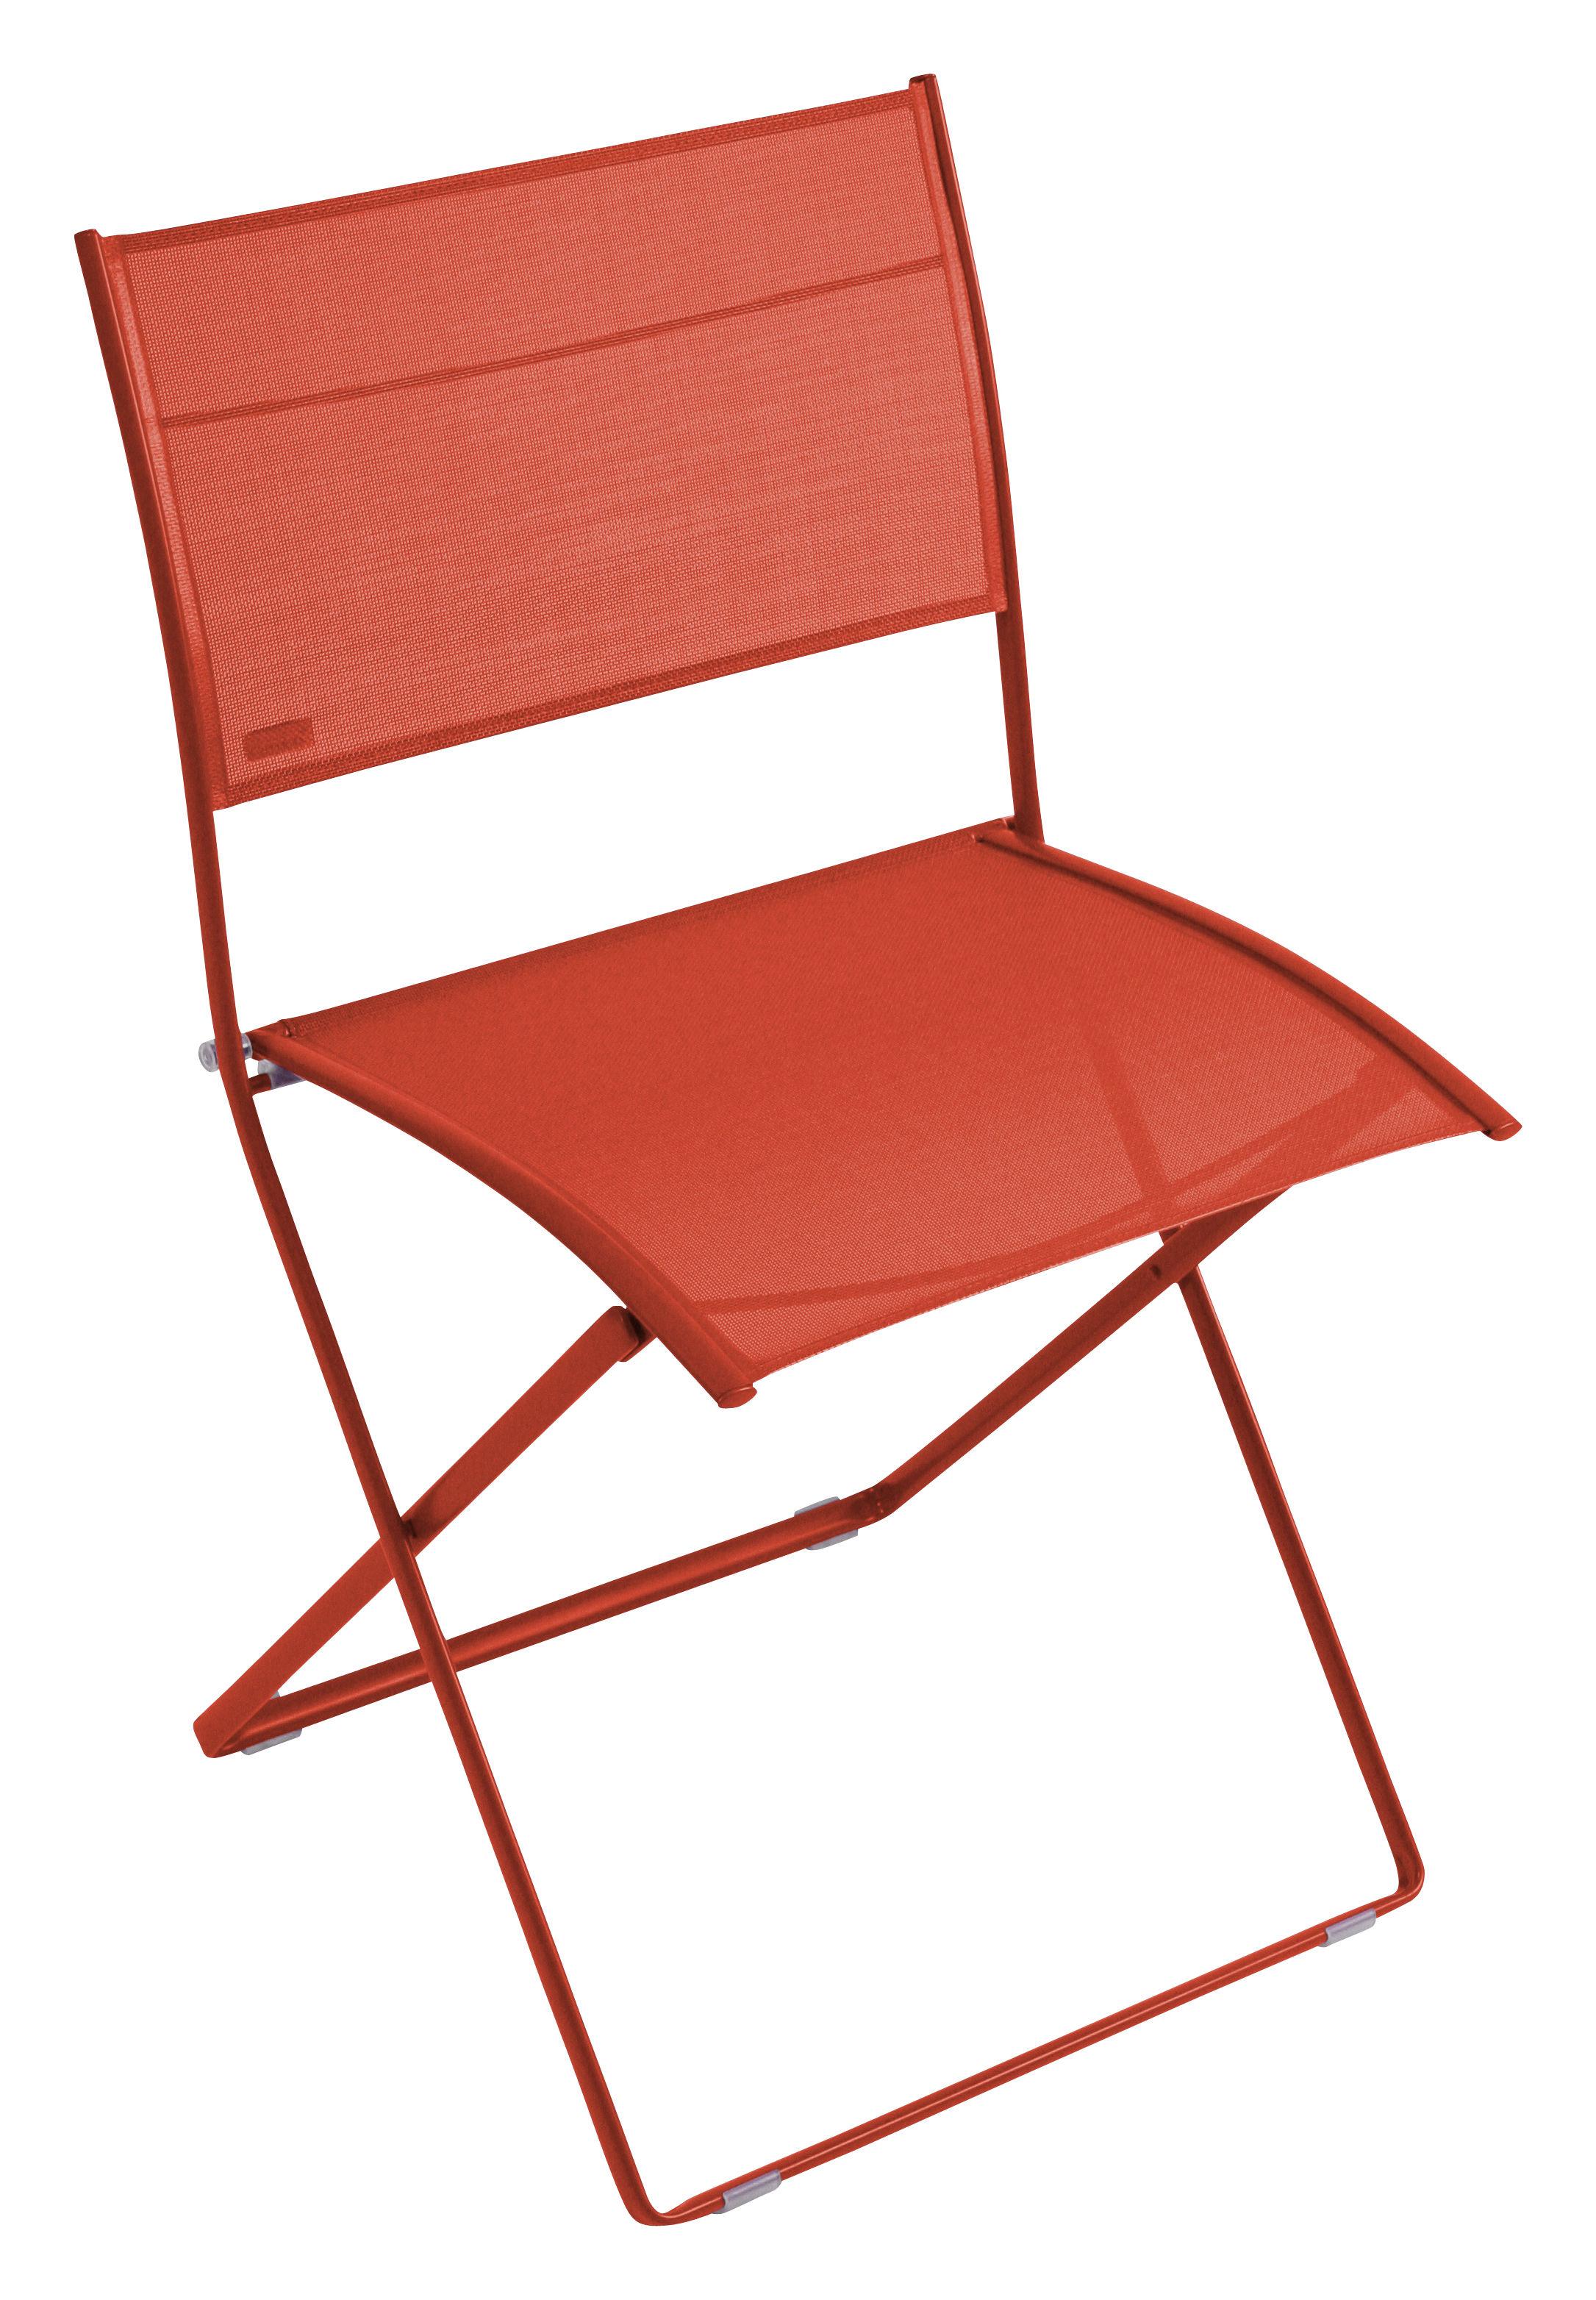 chaise pliante plein air toile paprika chin fermob. Black Bedroom Furniture Sets. Home Design Ideas